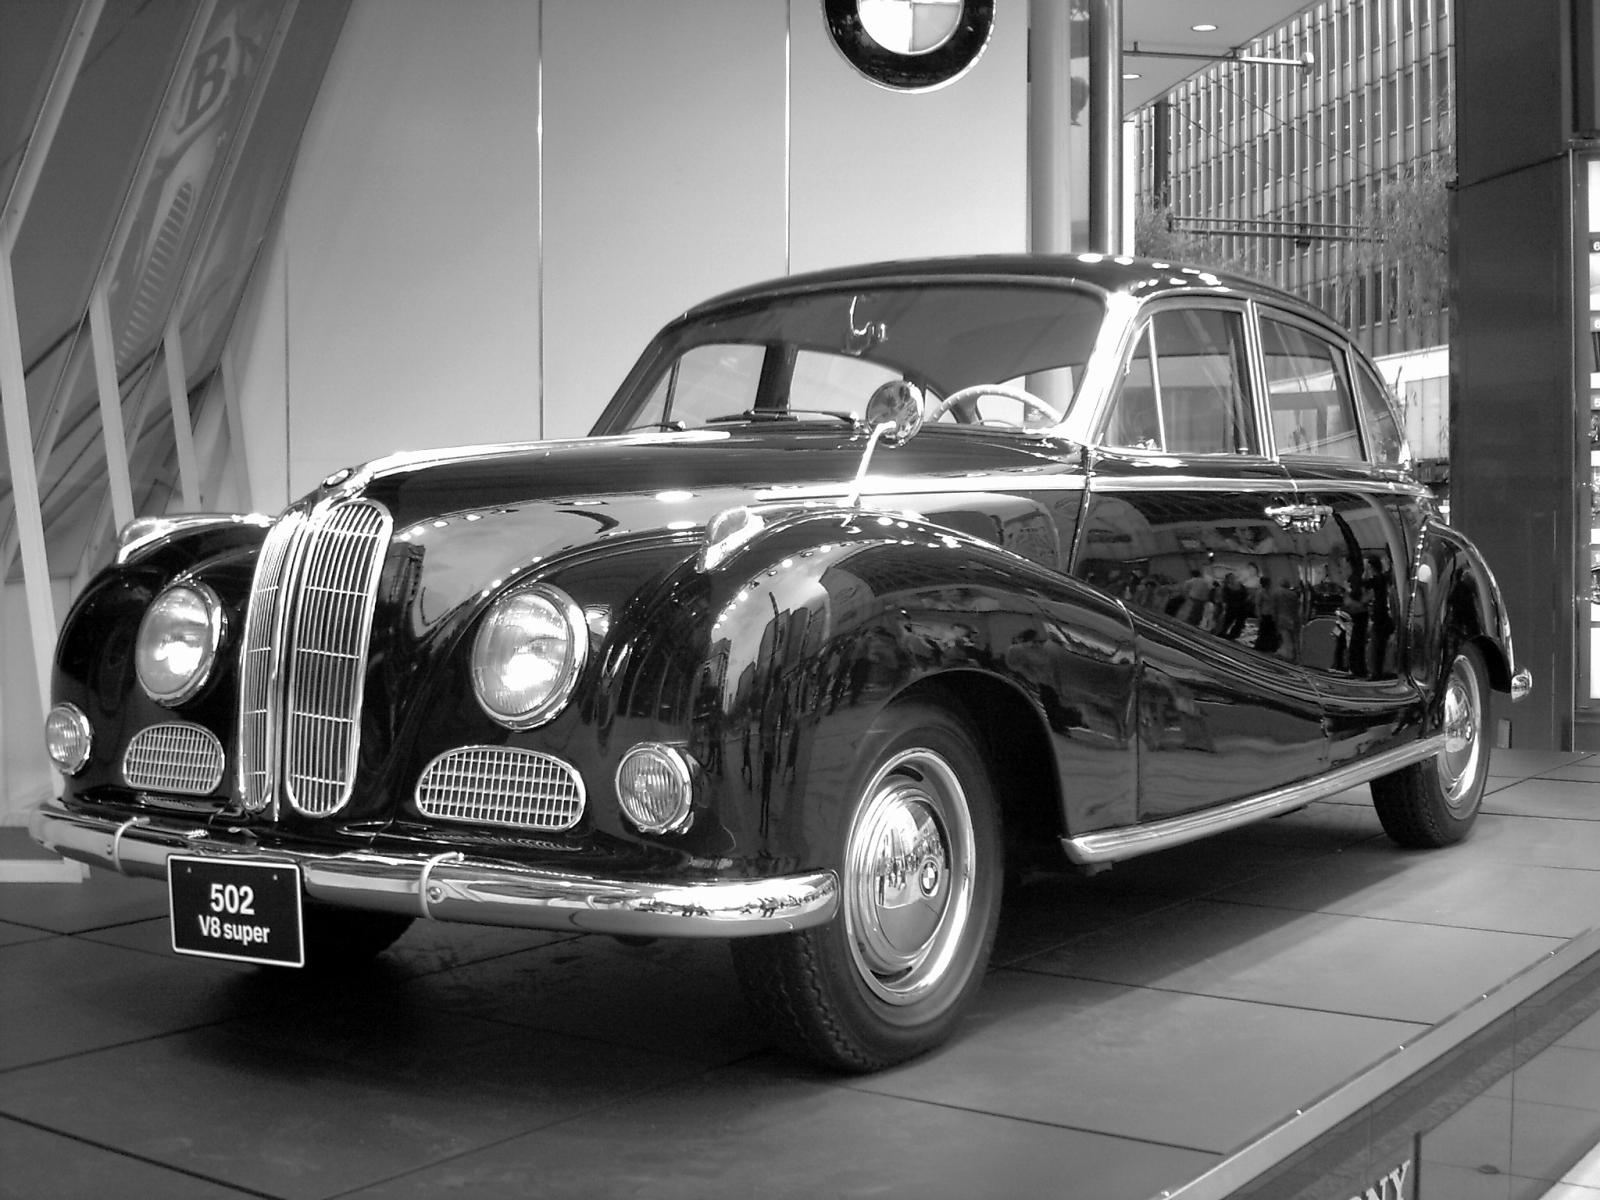 File:BMW 502 V8 (03).jpg - Wikimedia Commons